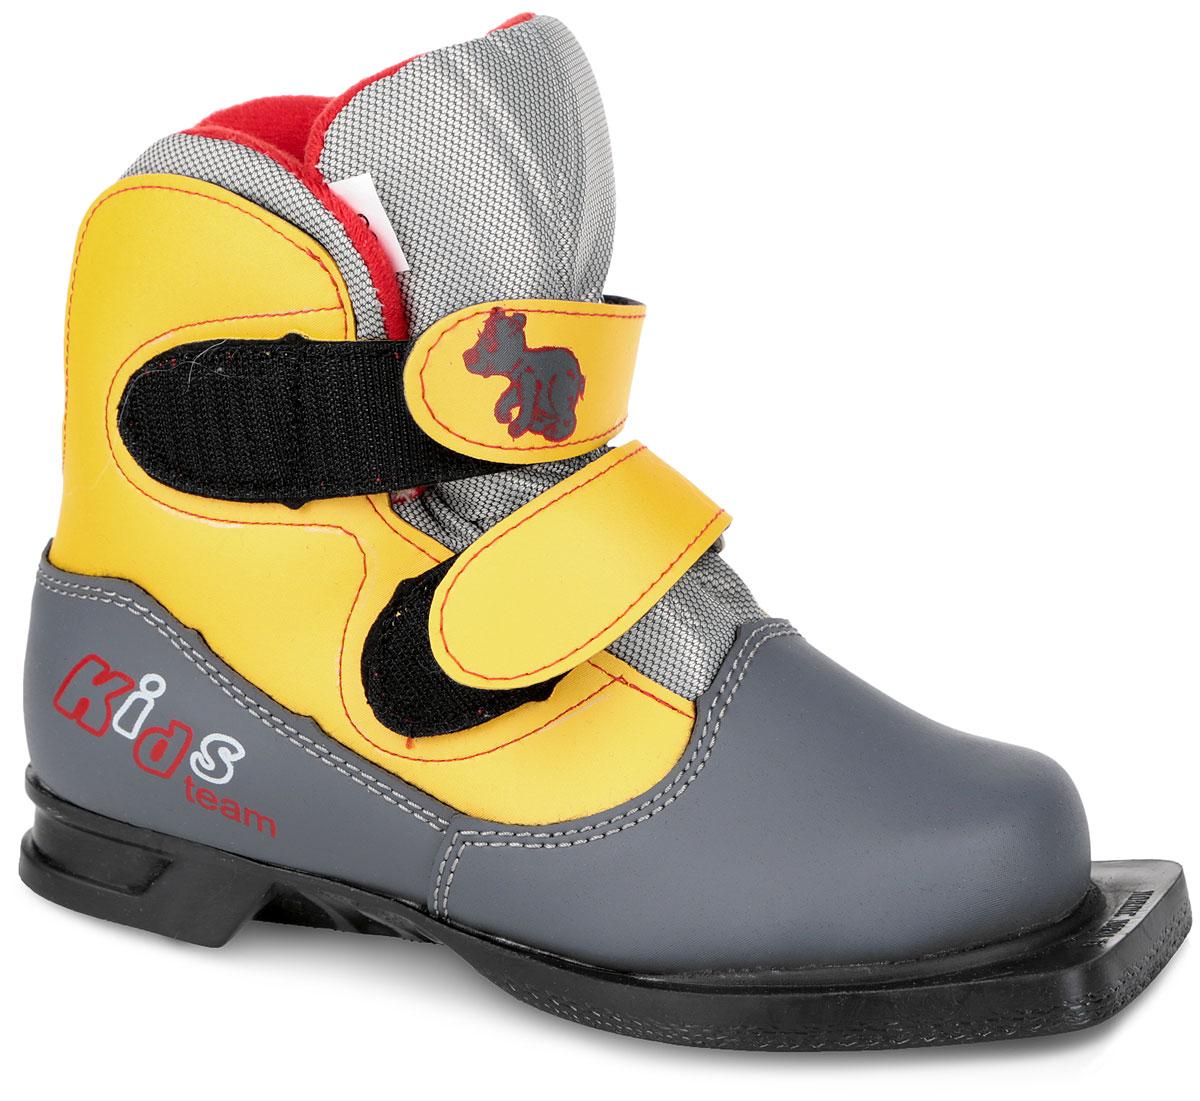 Ботинки лыжные детские Marax, цвет: серый, желтый. NN75. Размер 33